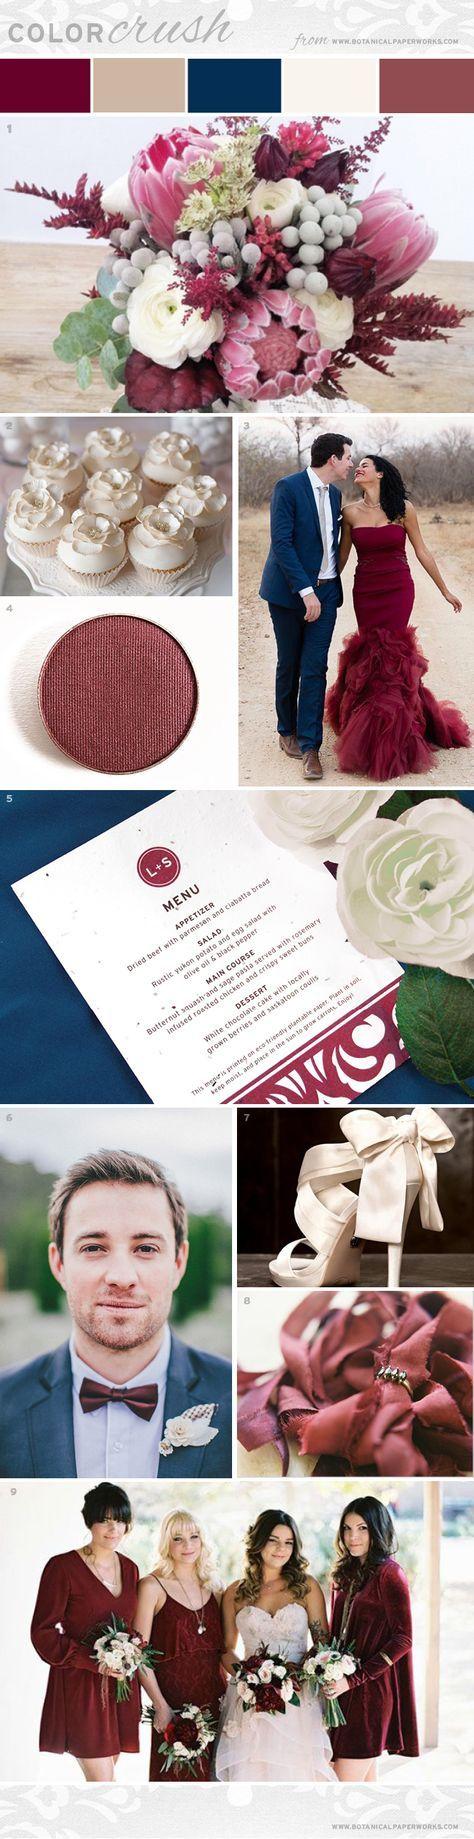 Maroon and cream wedding decor  inspiration board Color Crush  Pantone Color of the Year  Marsala